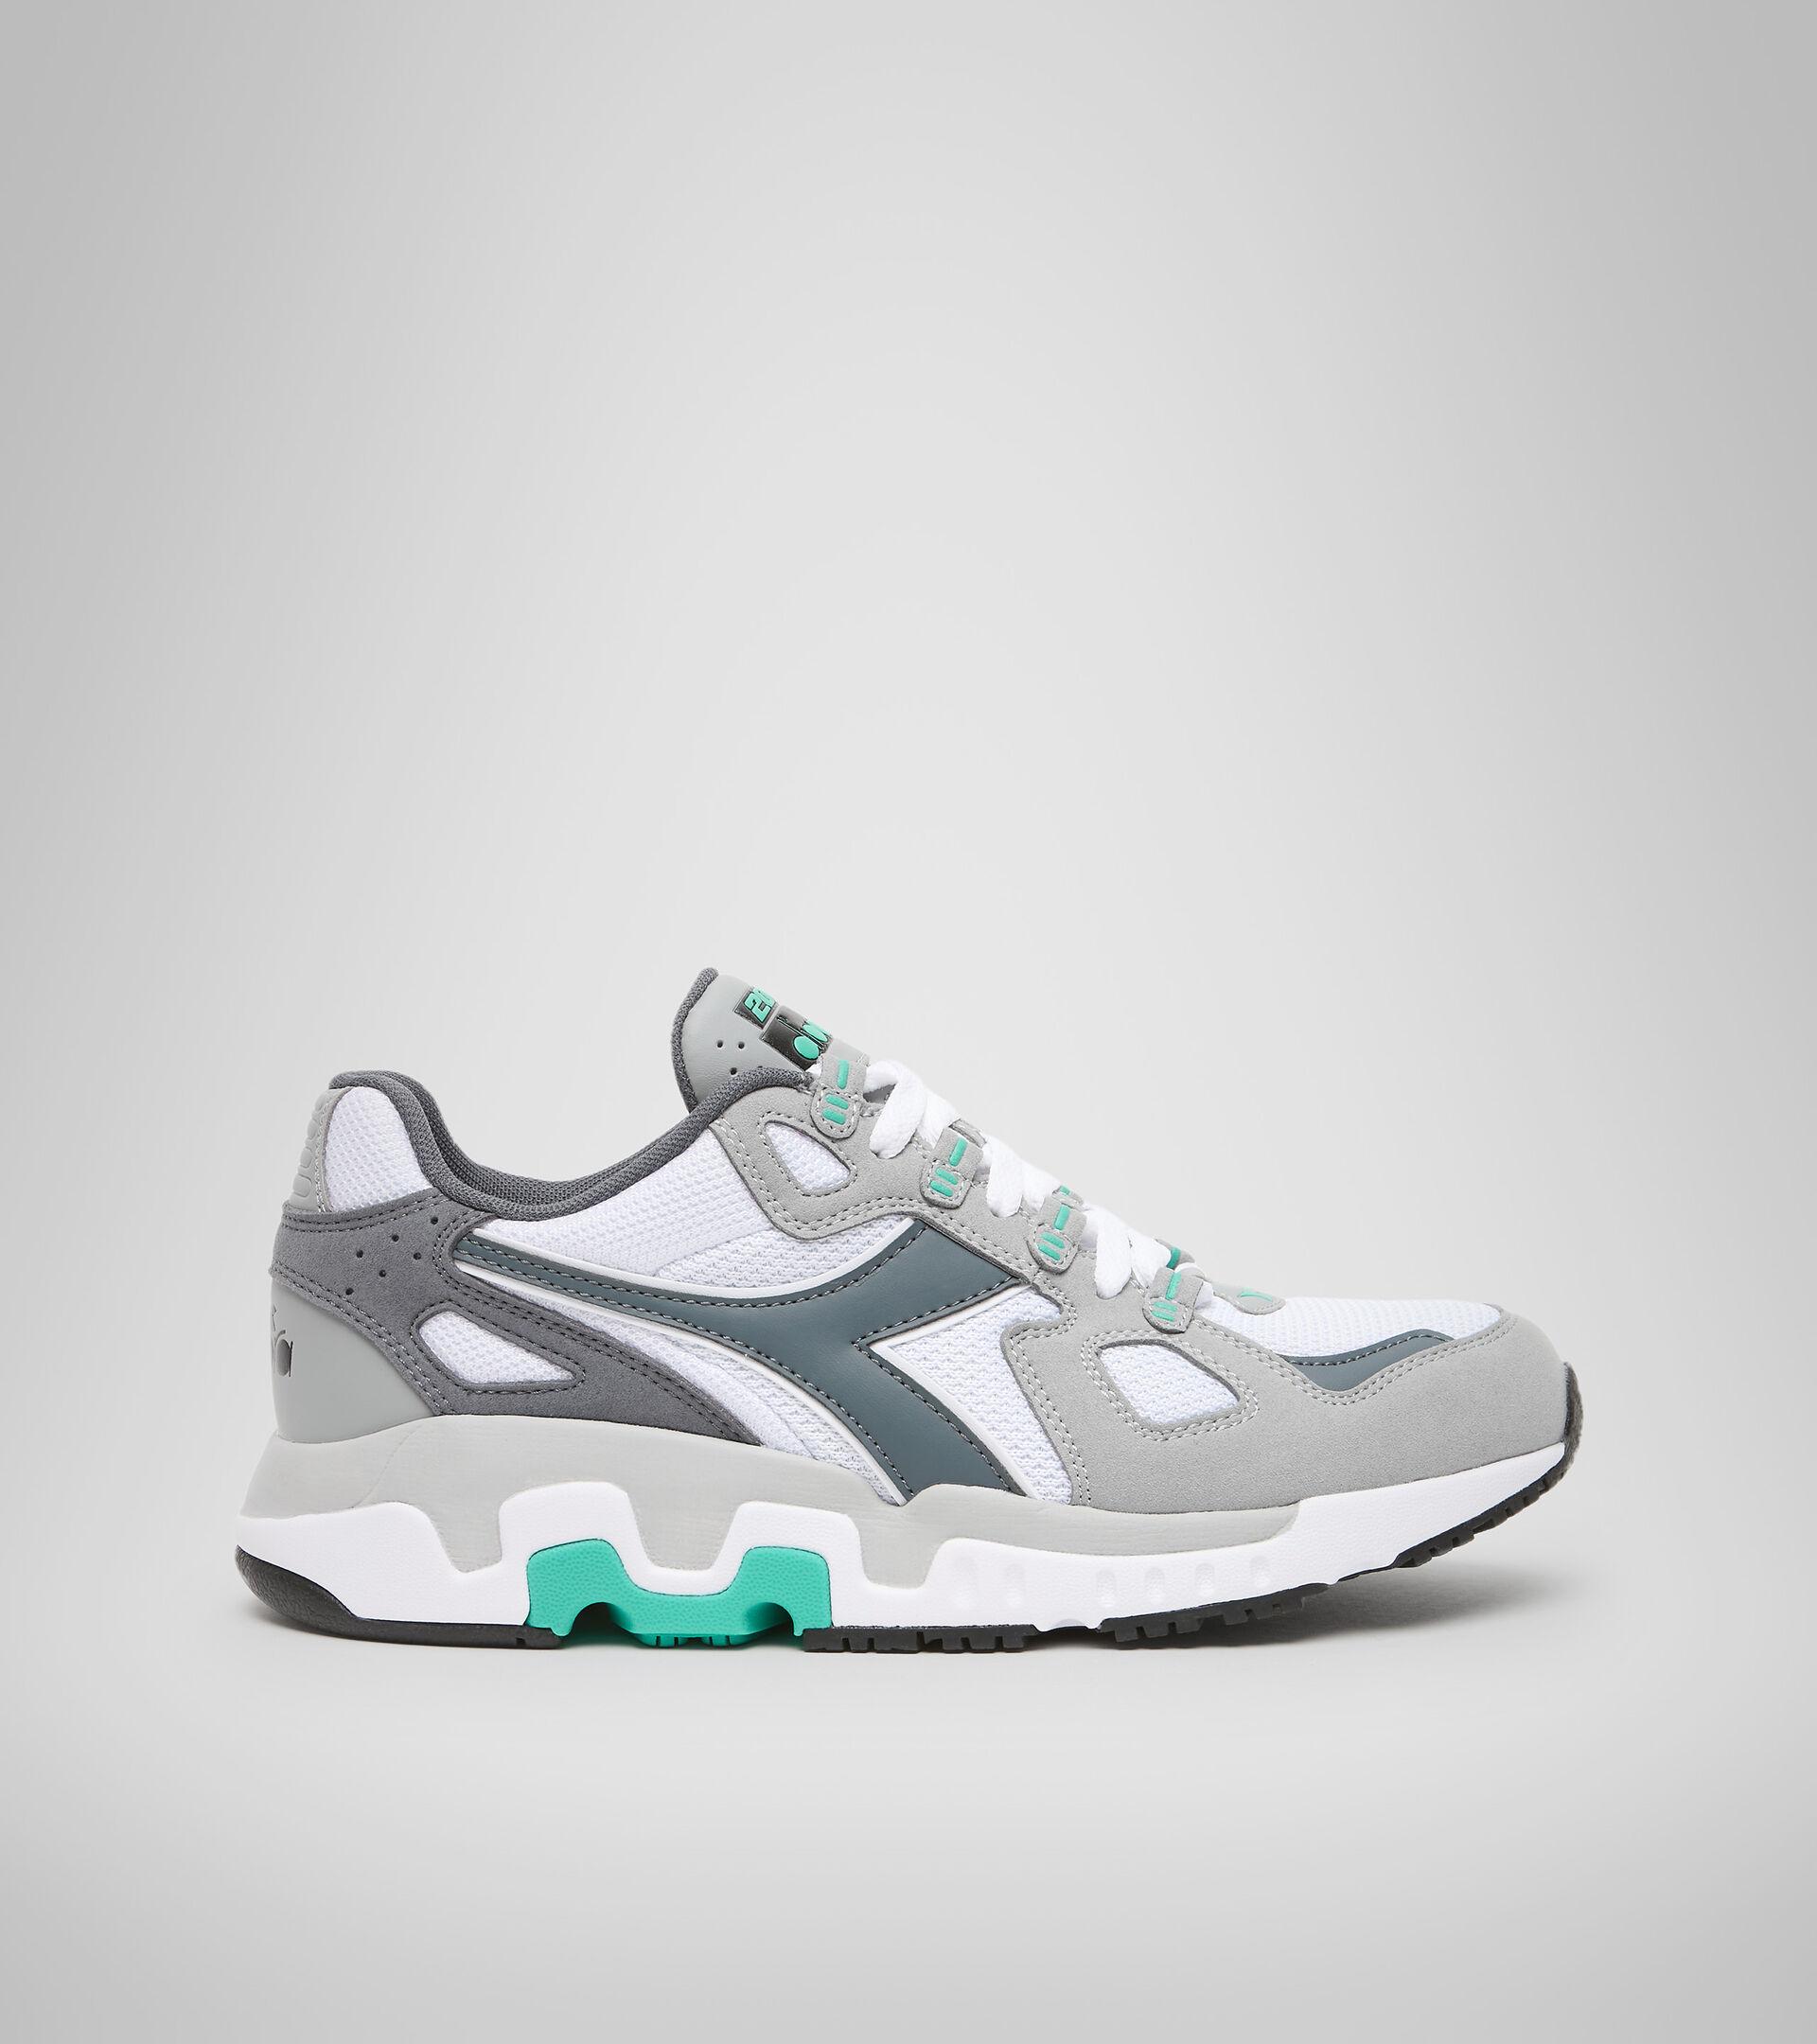 Footwear Sportswear UOMO MYTHOS SUEDE WHITE/GRIFFIN Diadora